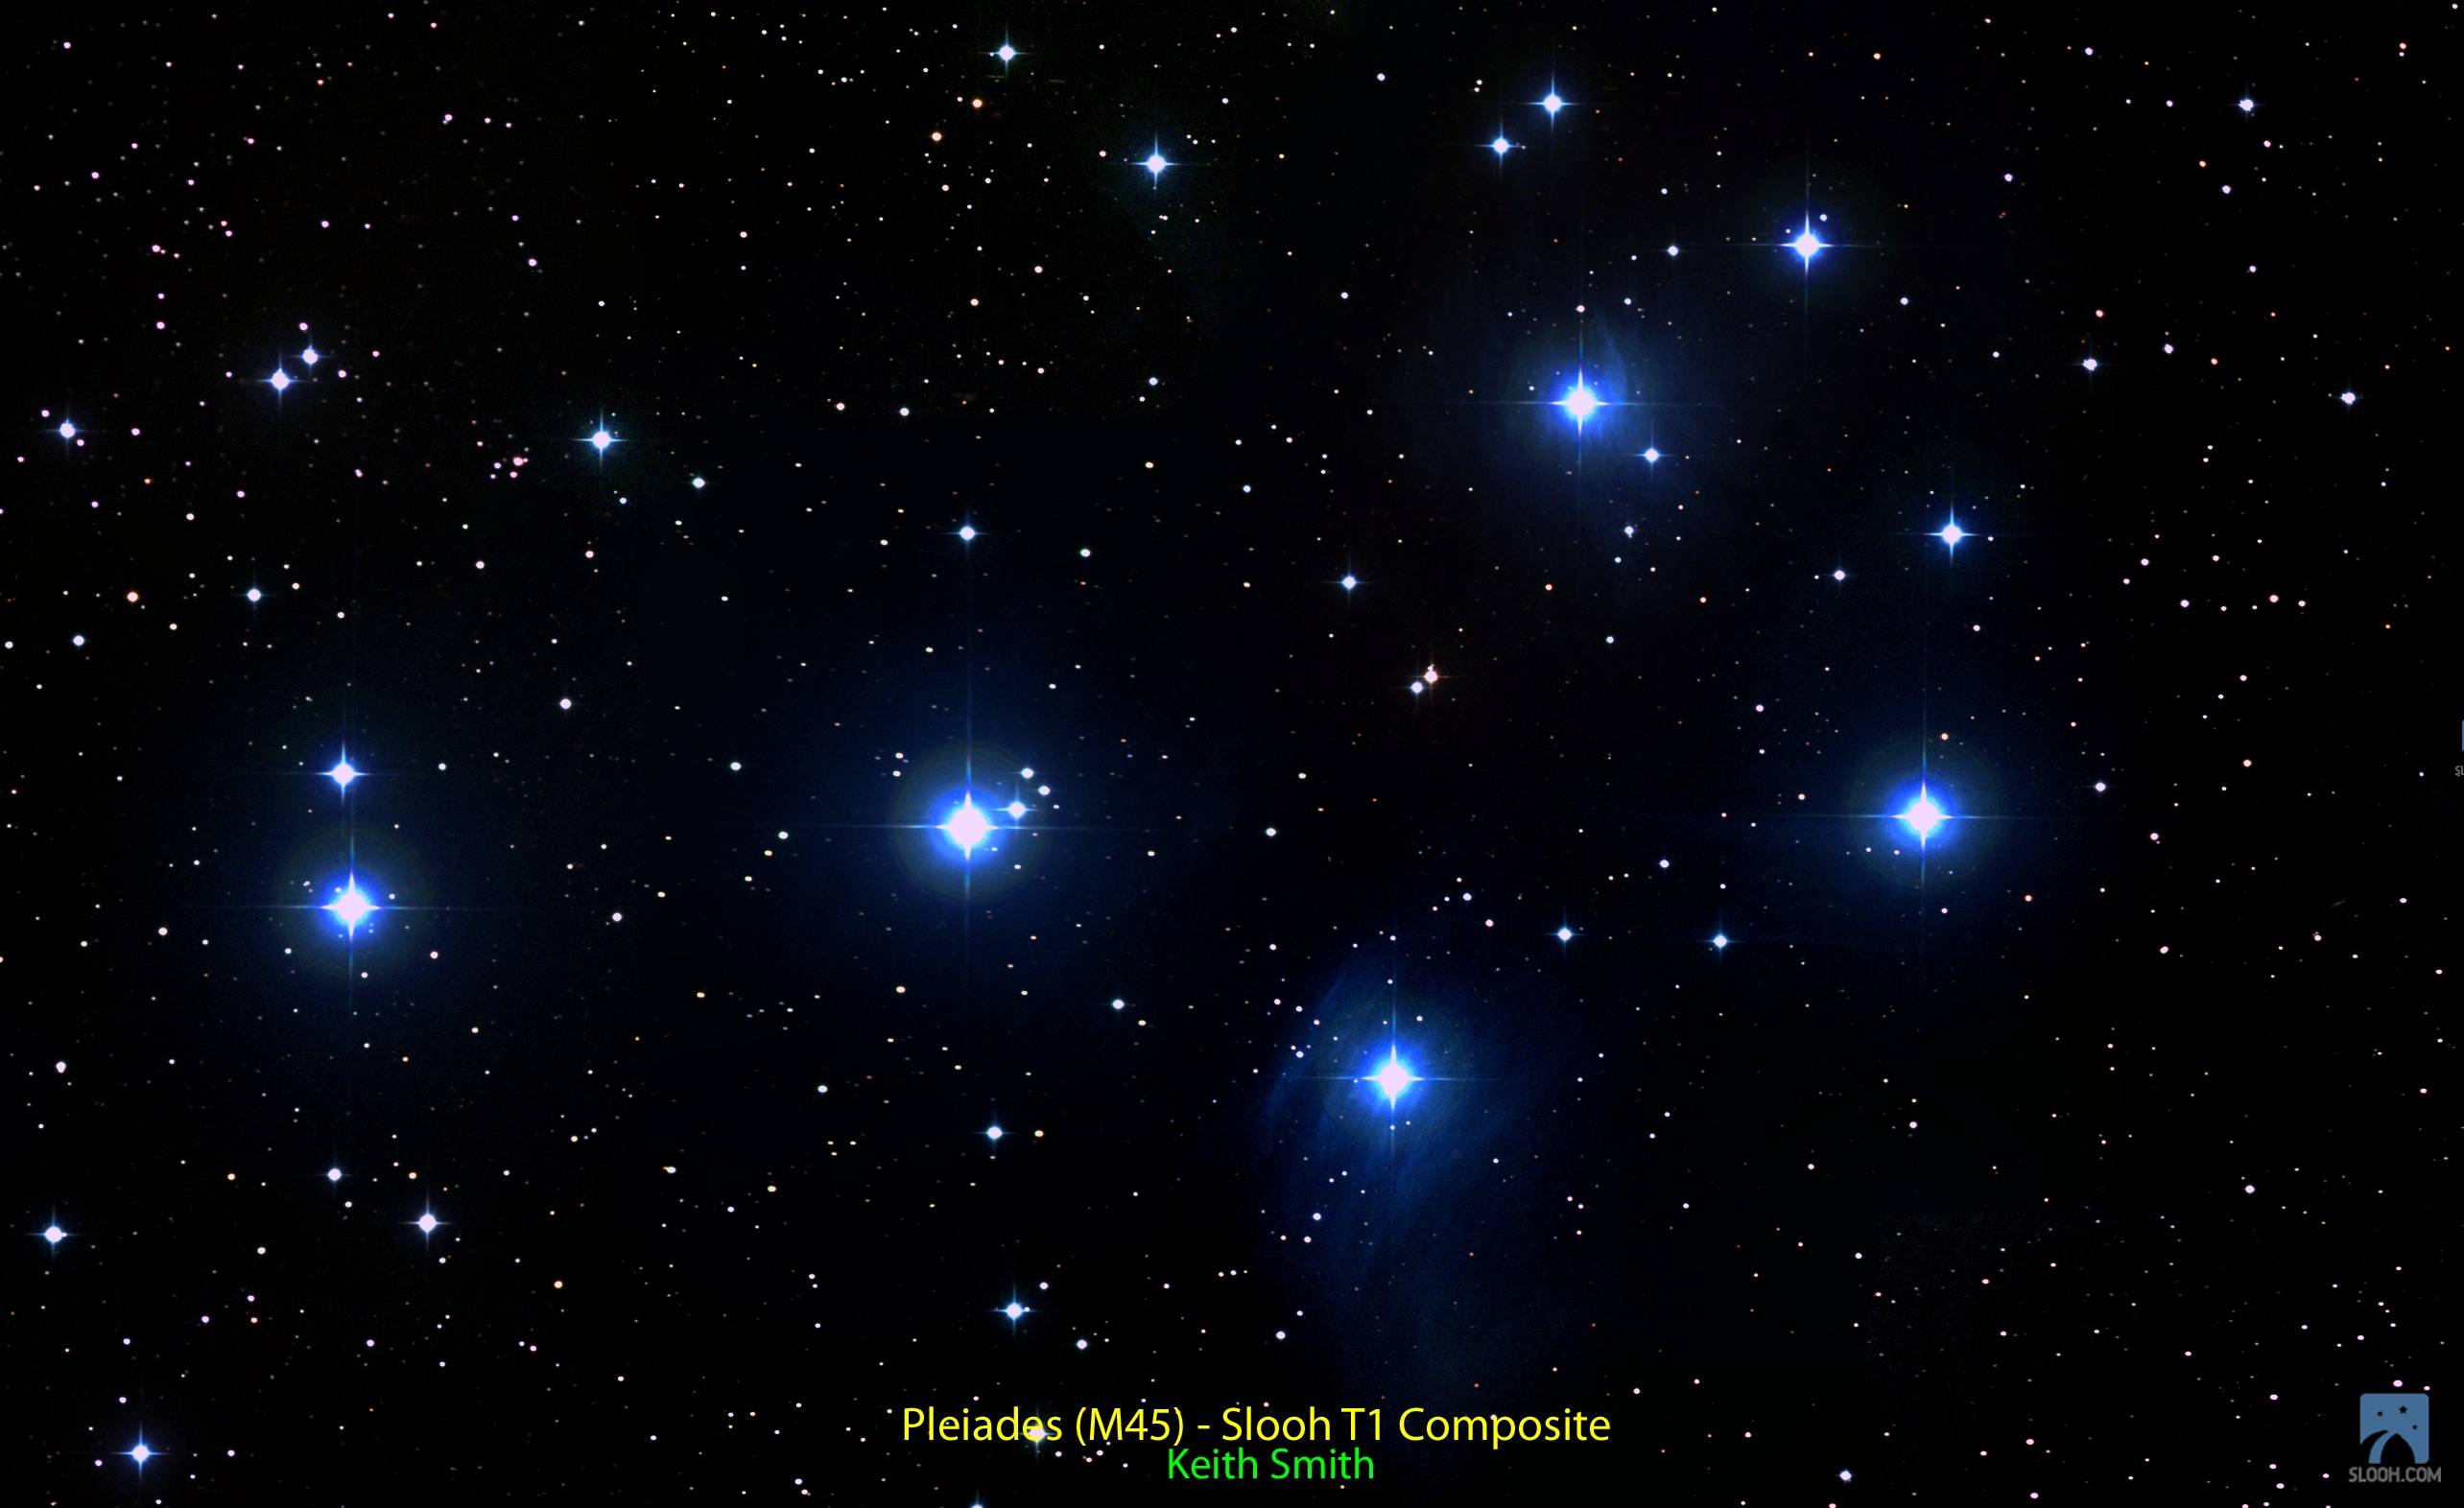 Pleiades by Slooh's T1 Telescope